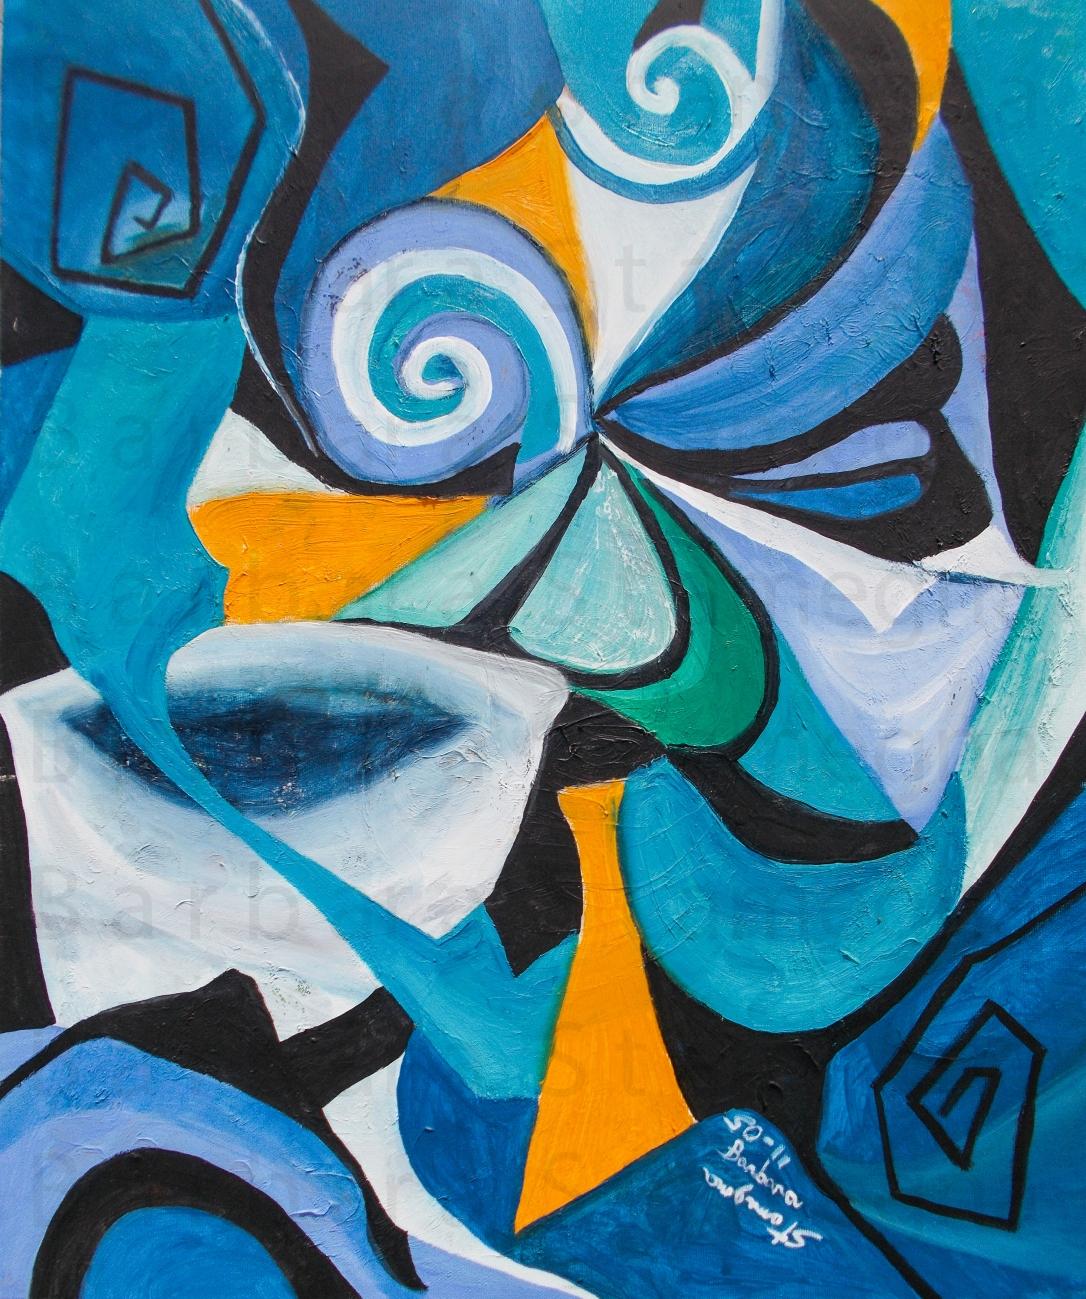 Blue Mood Sensation Abstract original painting made by Barbara Stamegna